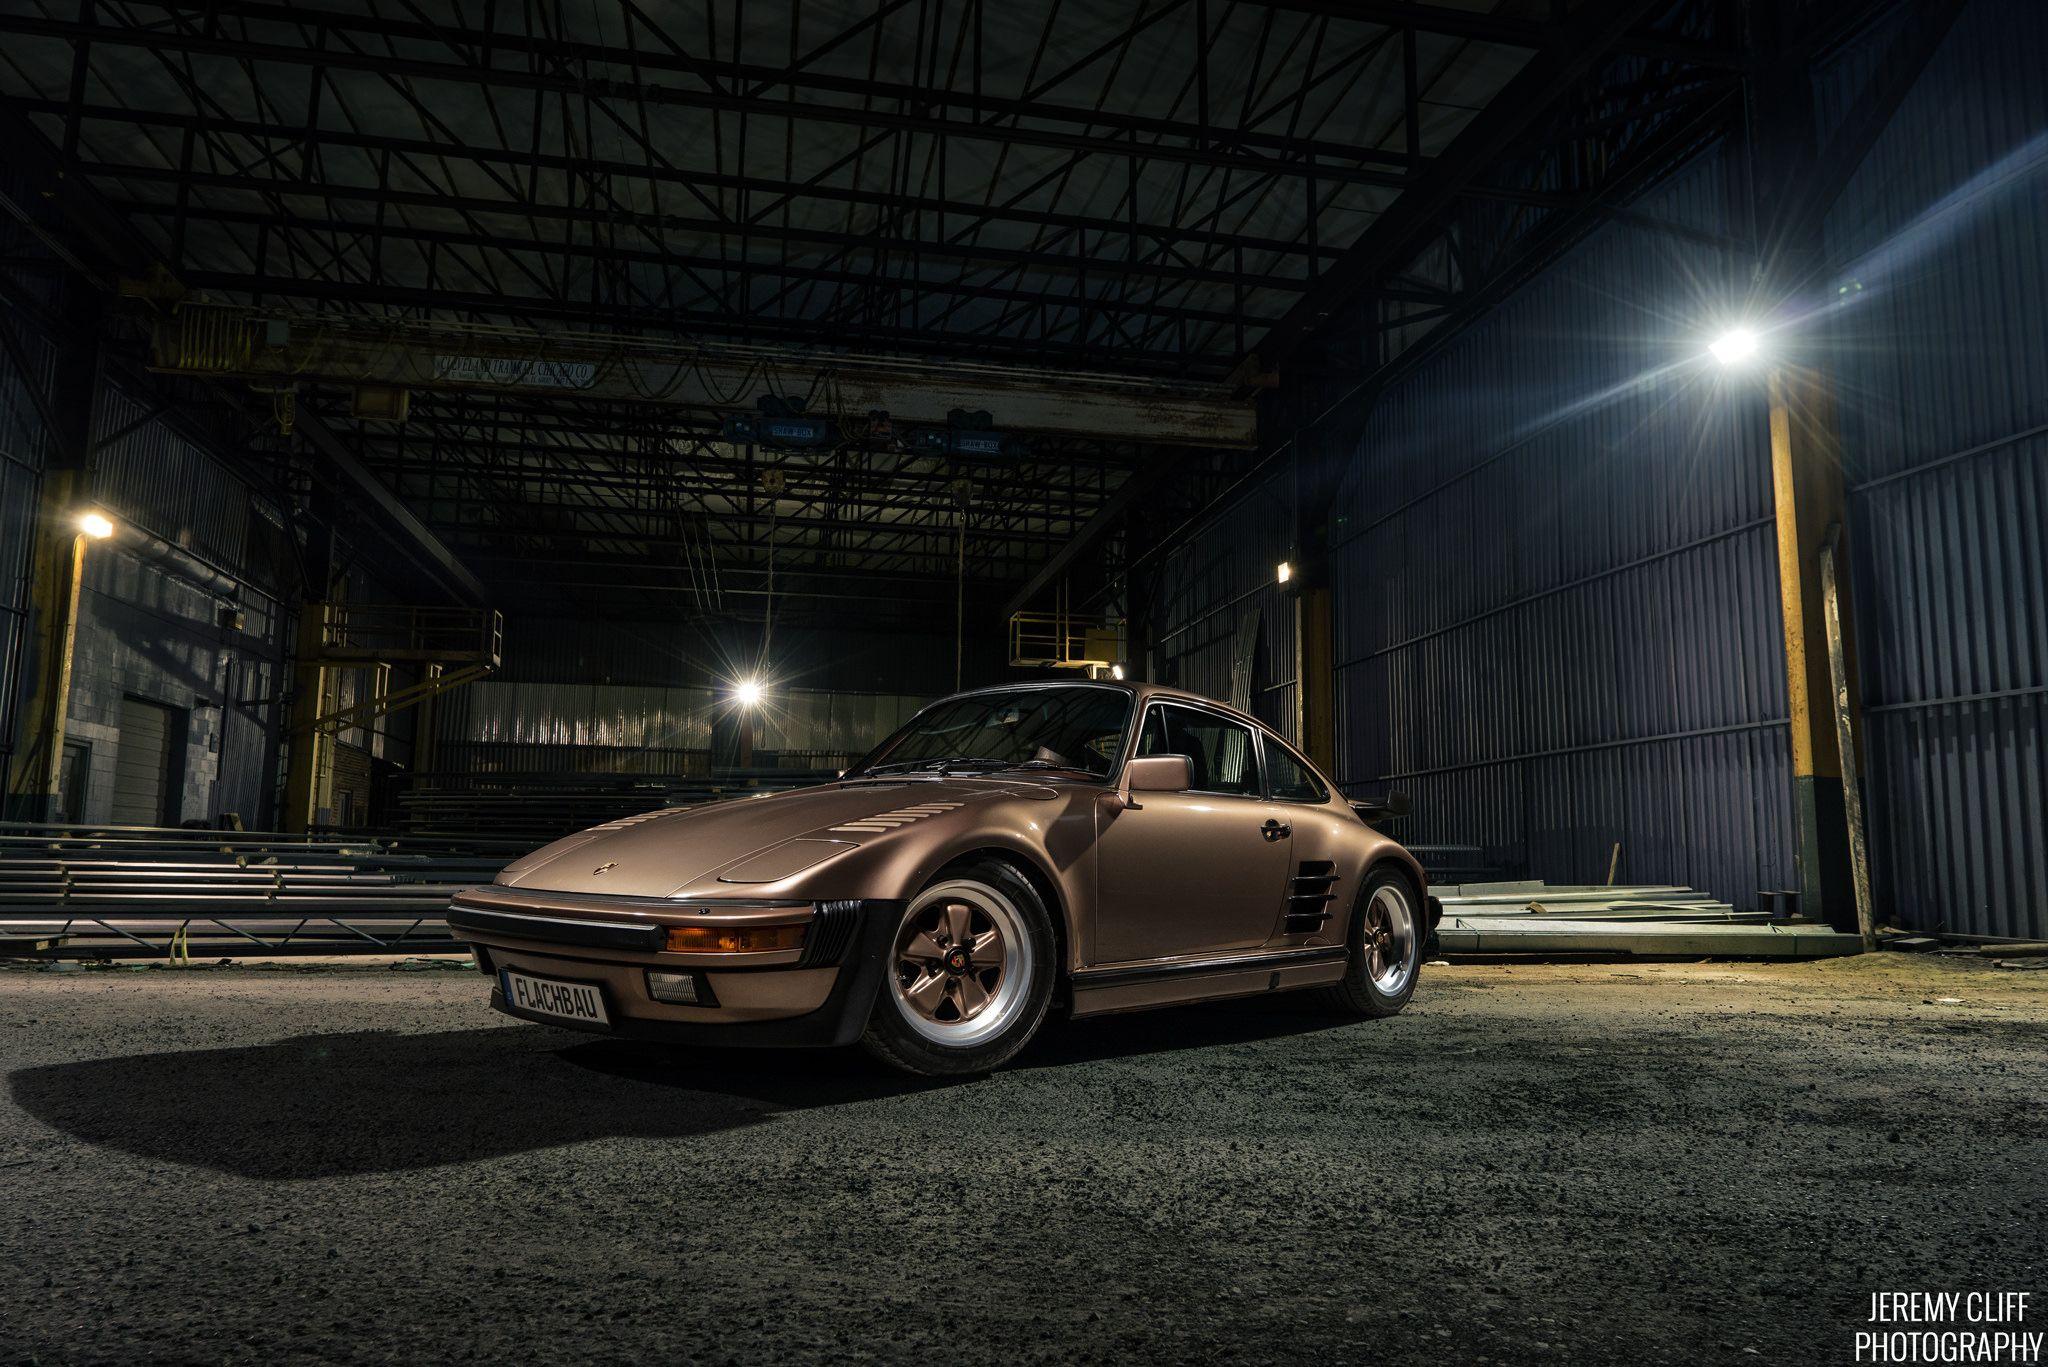 https://flic.kr/p/D4Y6uF | Porsche 935 Slantnose Turbo | Porsche 935 Slantnose Turbo  Full set www.JeremyCliff.com